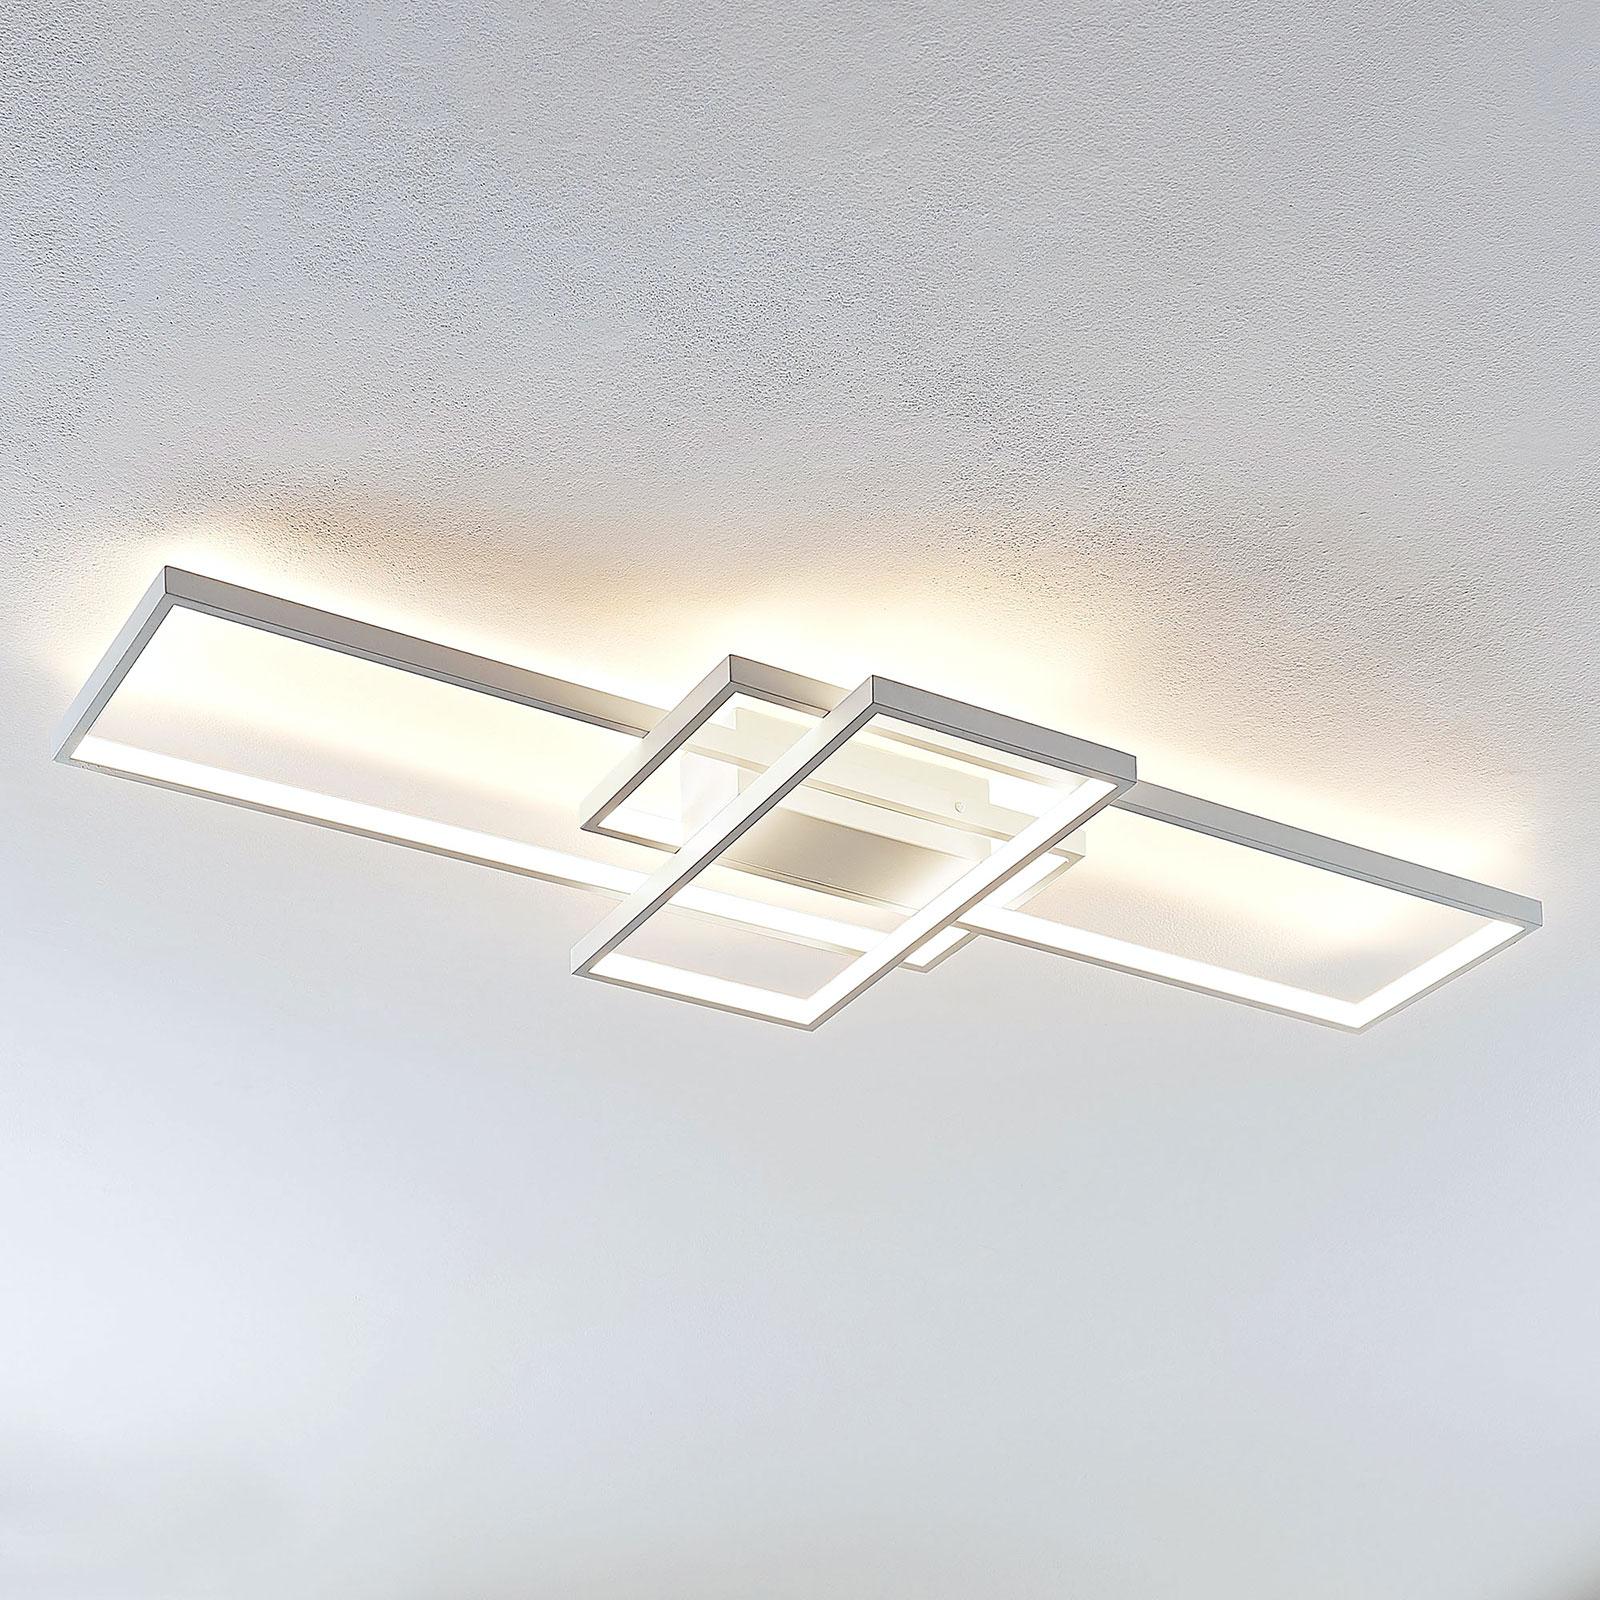 Lindby Poppy plafoniera LED con funzione dimming